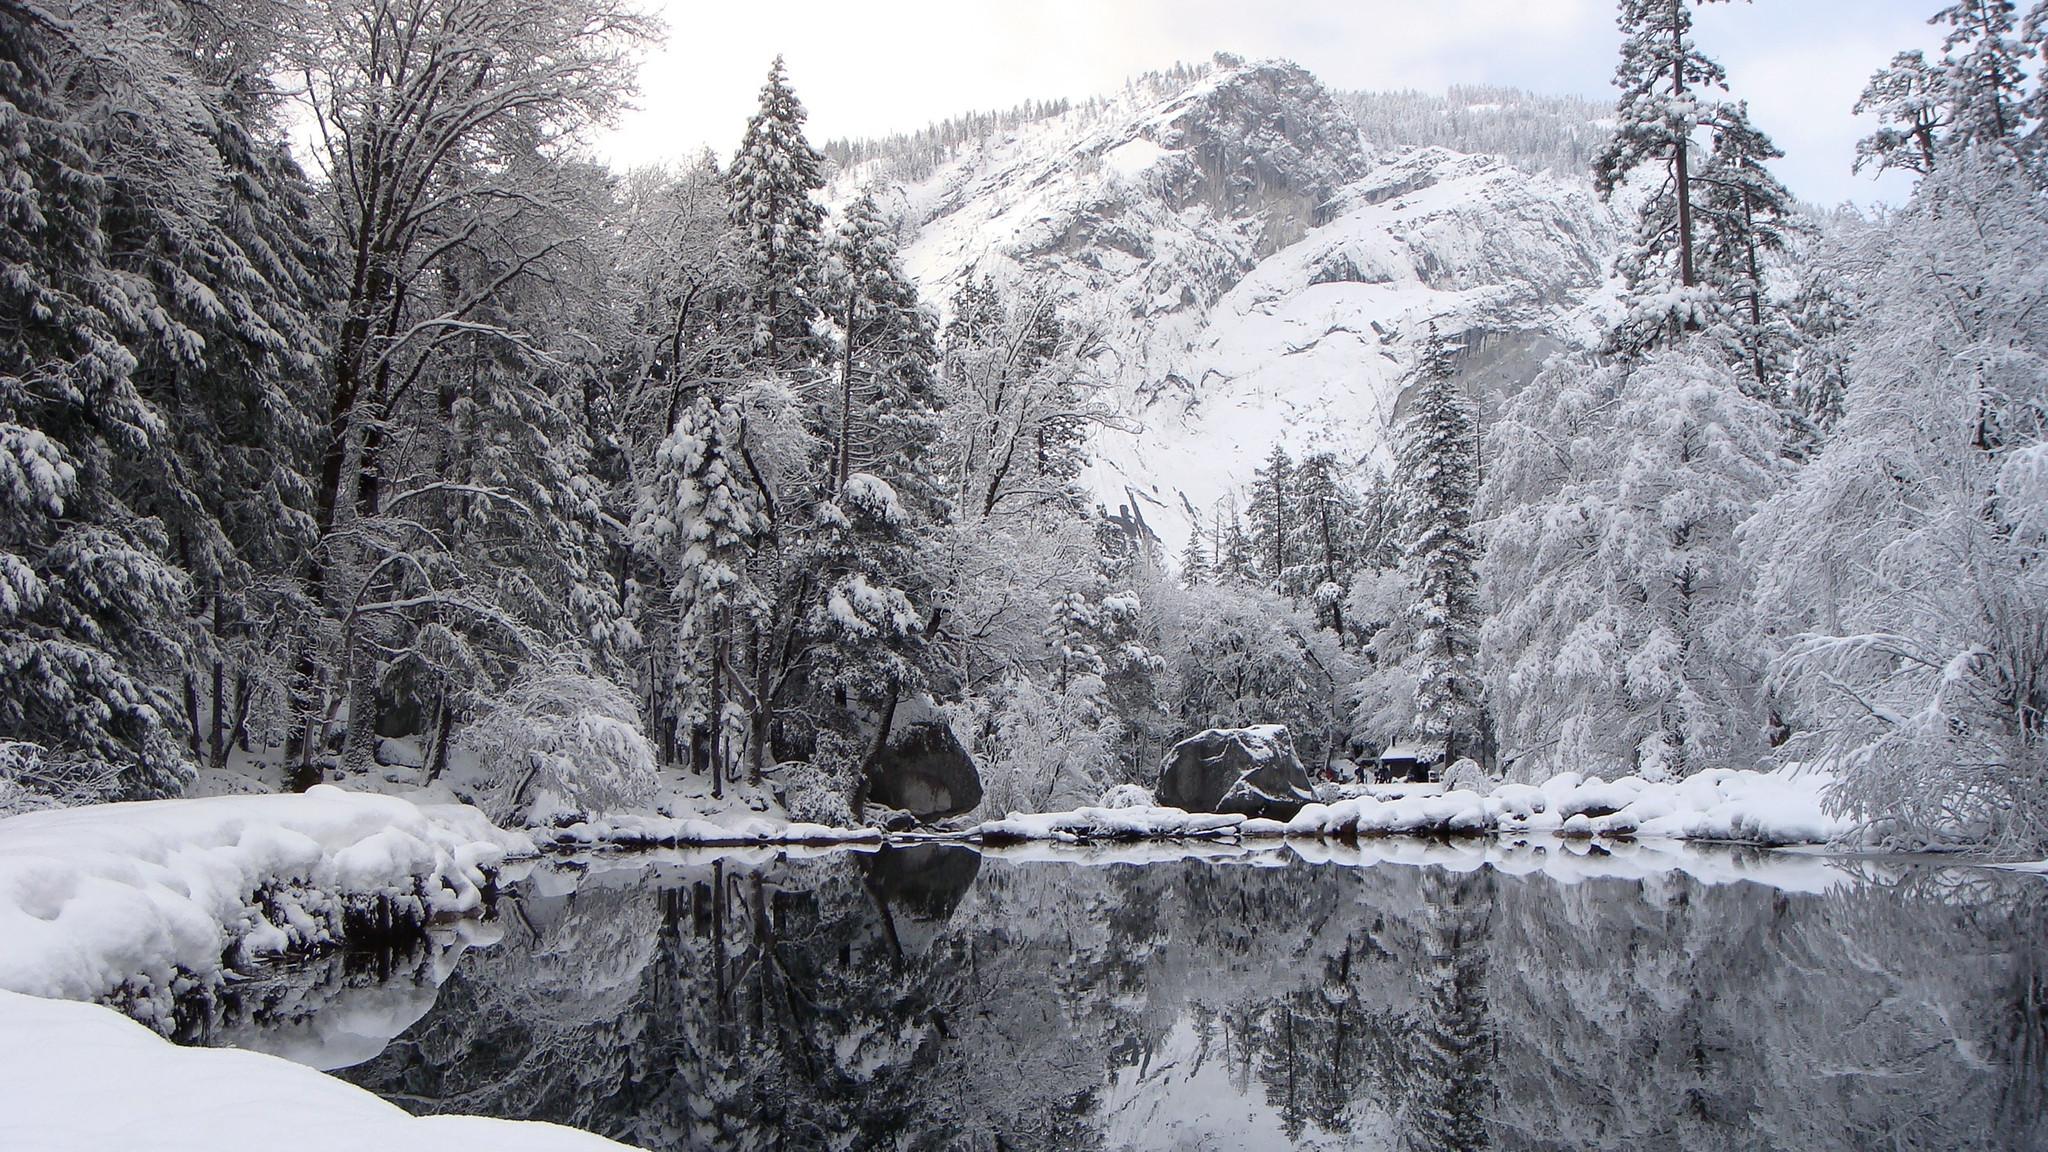 ws_Winter_reflection_2560x1440.jpg